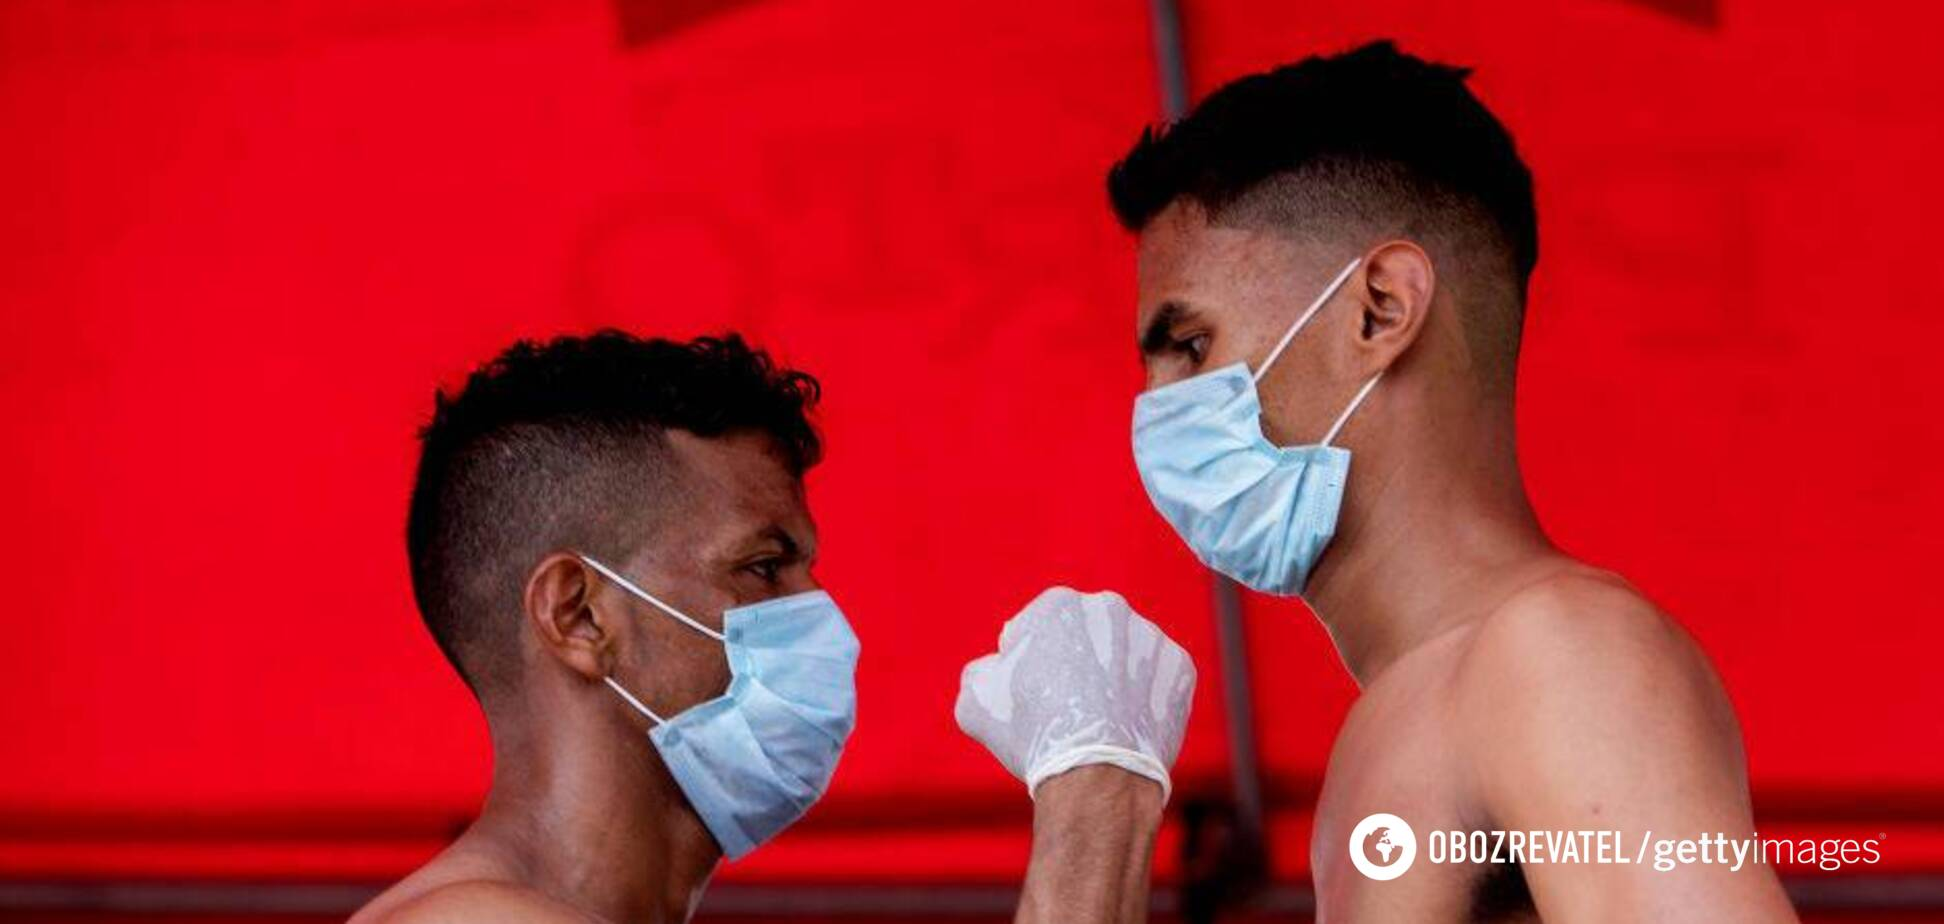 Минздрав пояснил, нужна ли маска во время занятия спортом